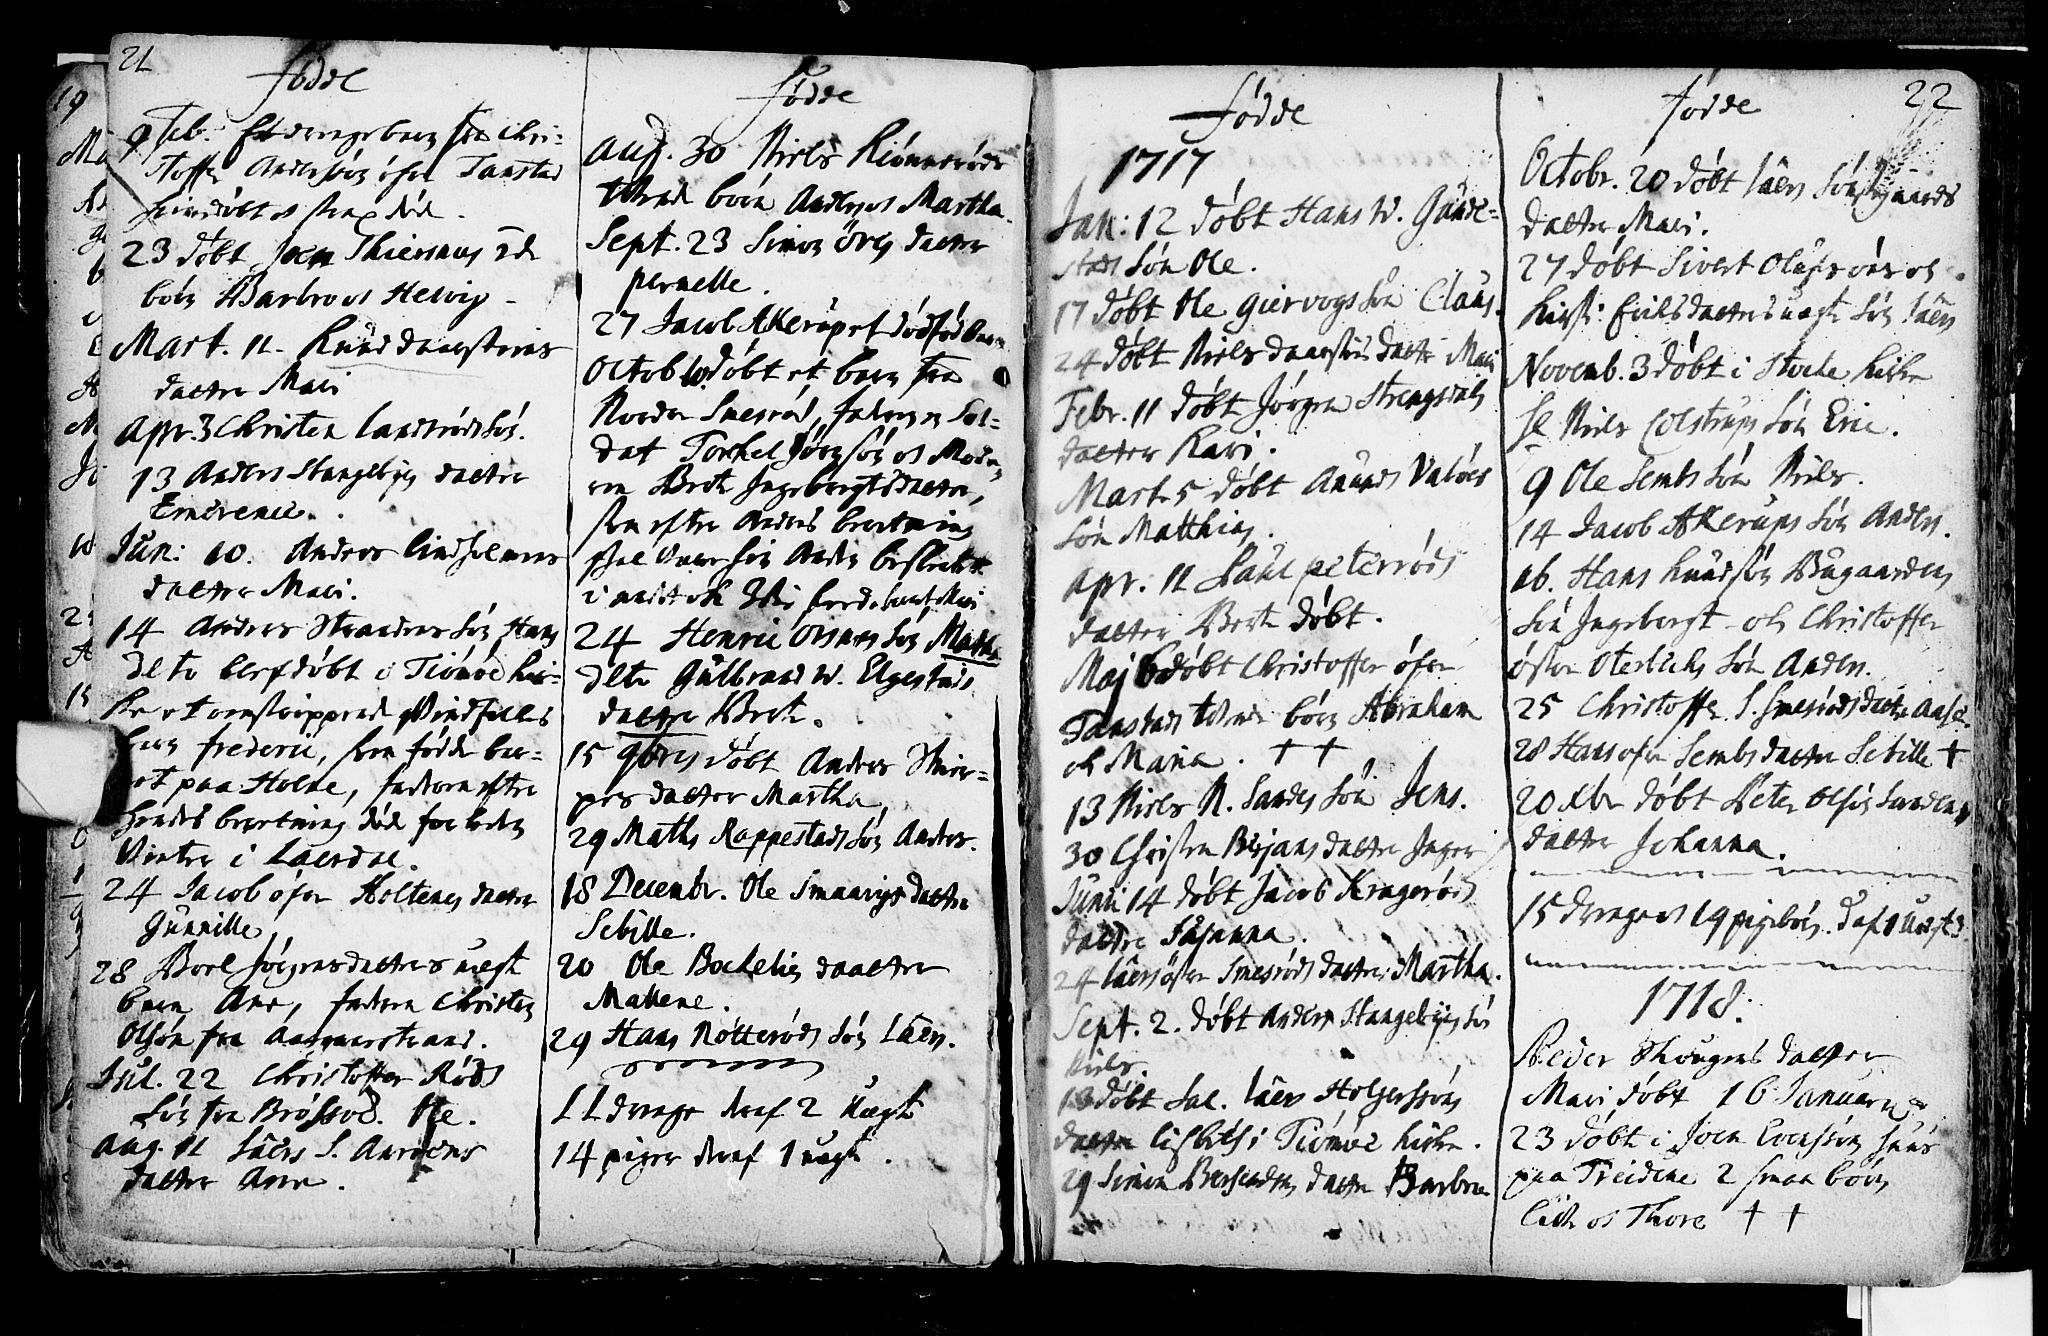 SAKO, Nøtterøy kirkebøker, F/Fa/L0001: Ministerialbok nr. I 1, 1686-1738, s. 21-22